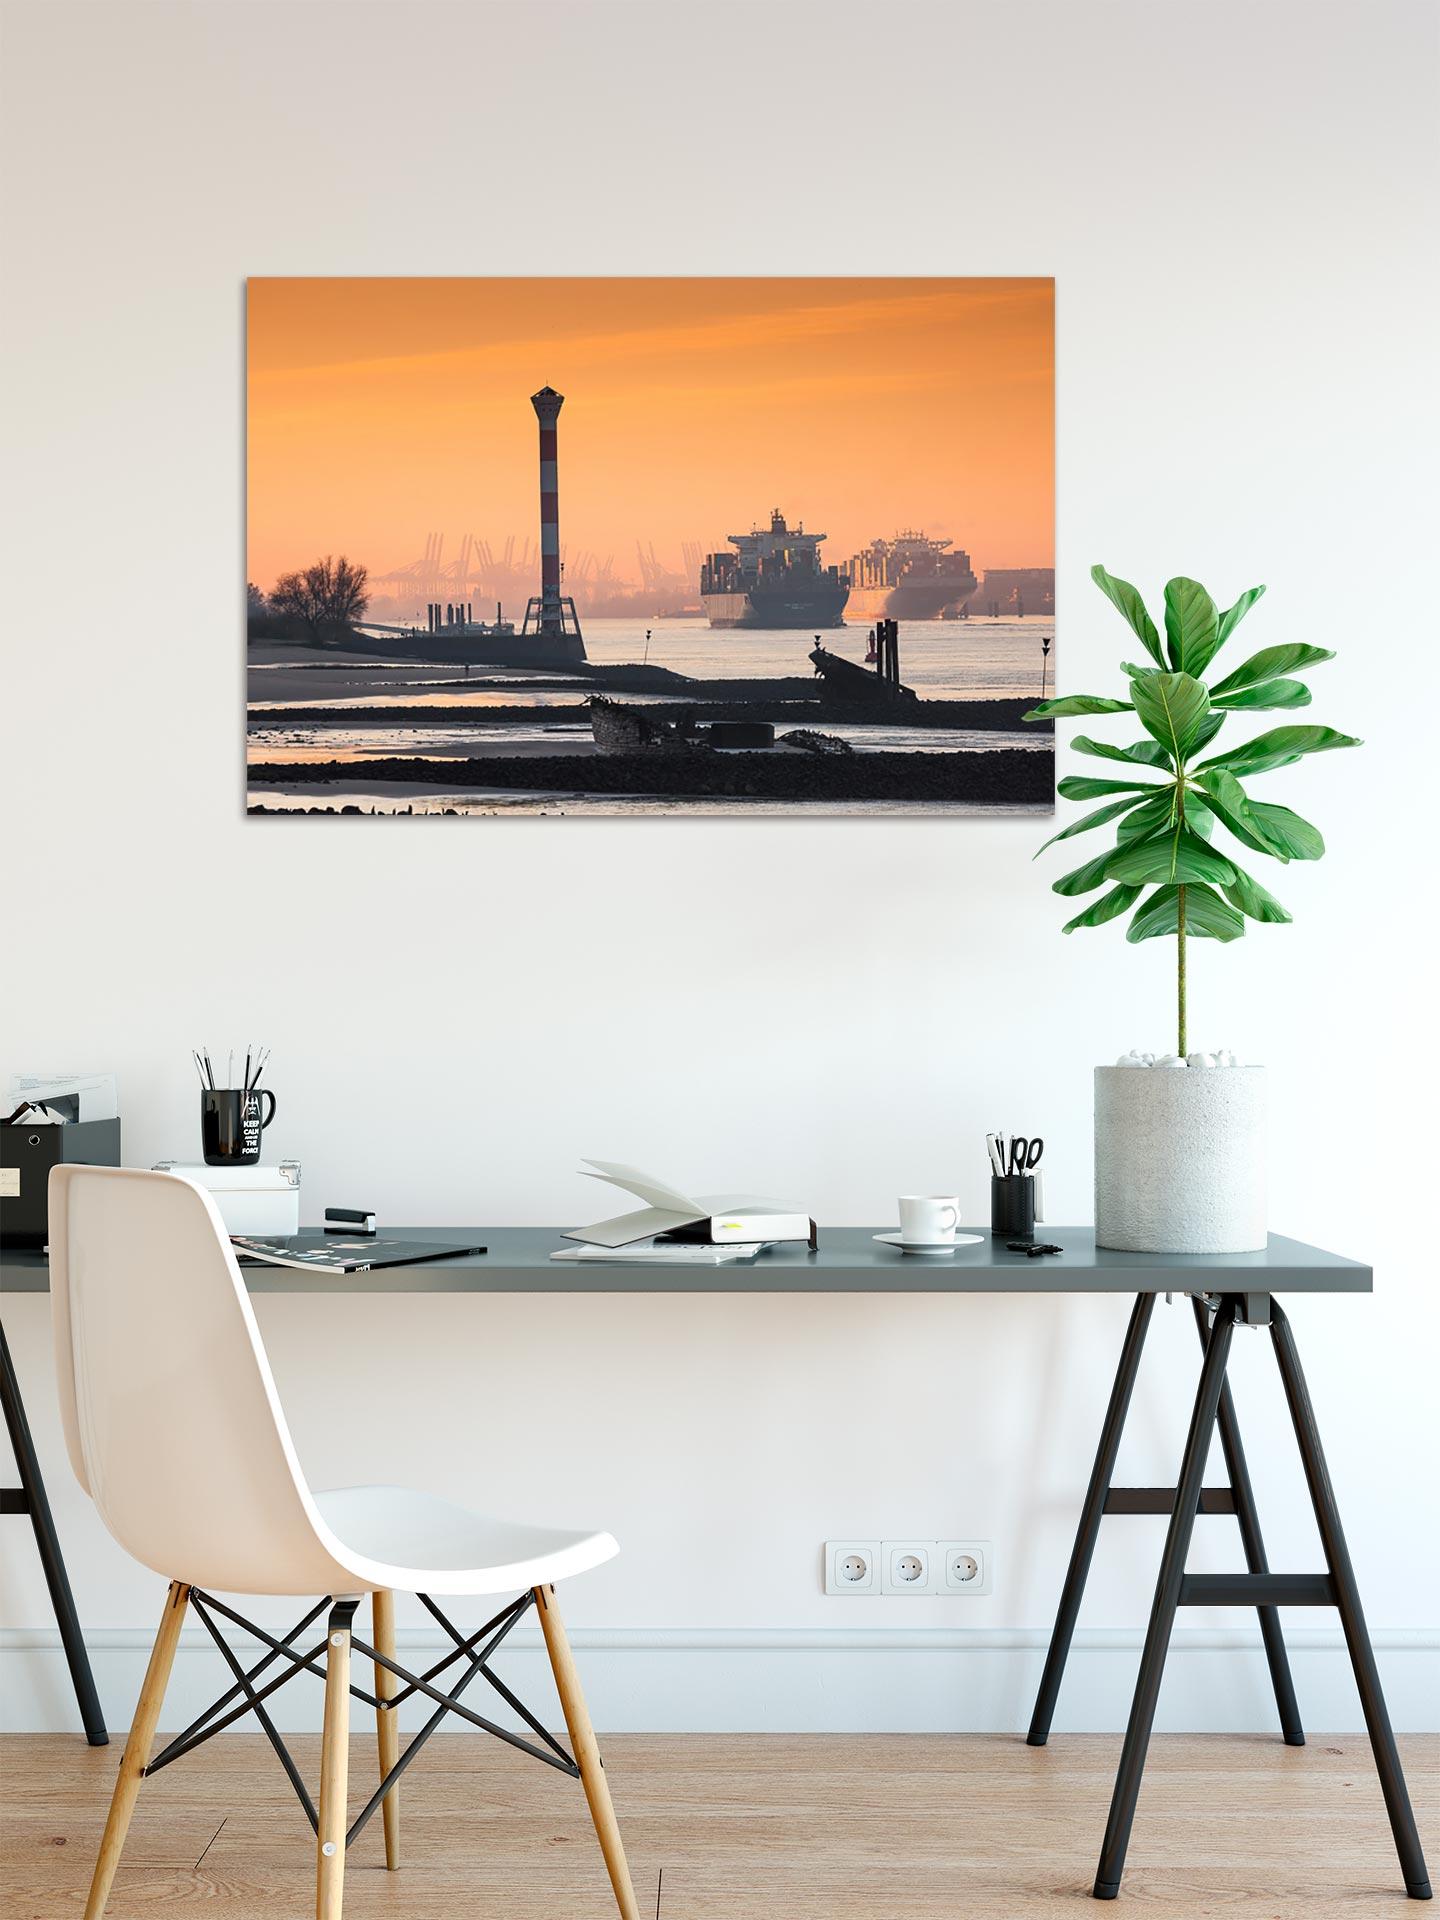 JS063-sonnenaufgang-wandbild-bild-auf-leinwand-acrylglas-aludibond-arbeitszimmer